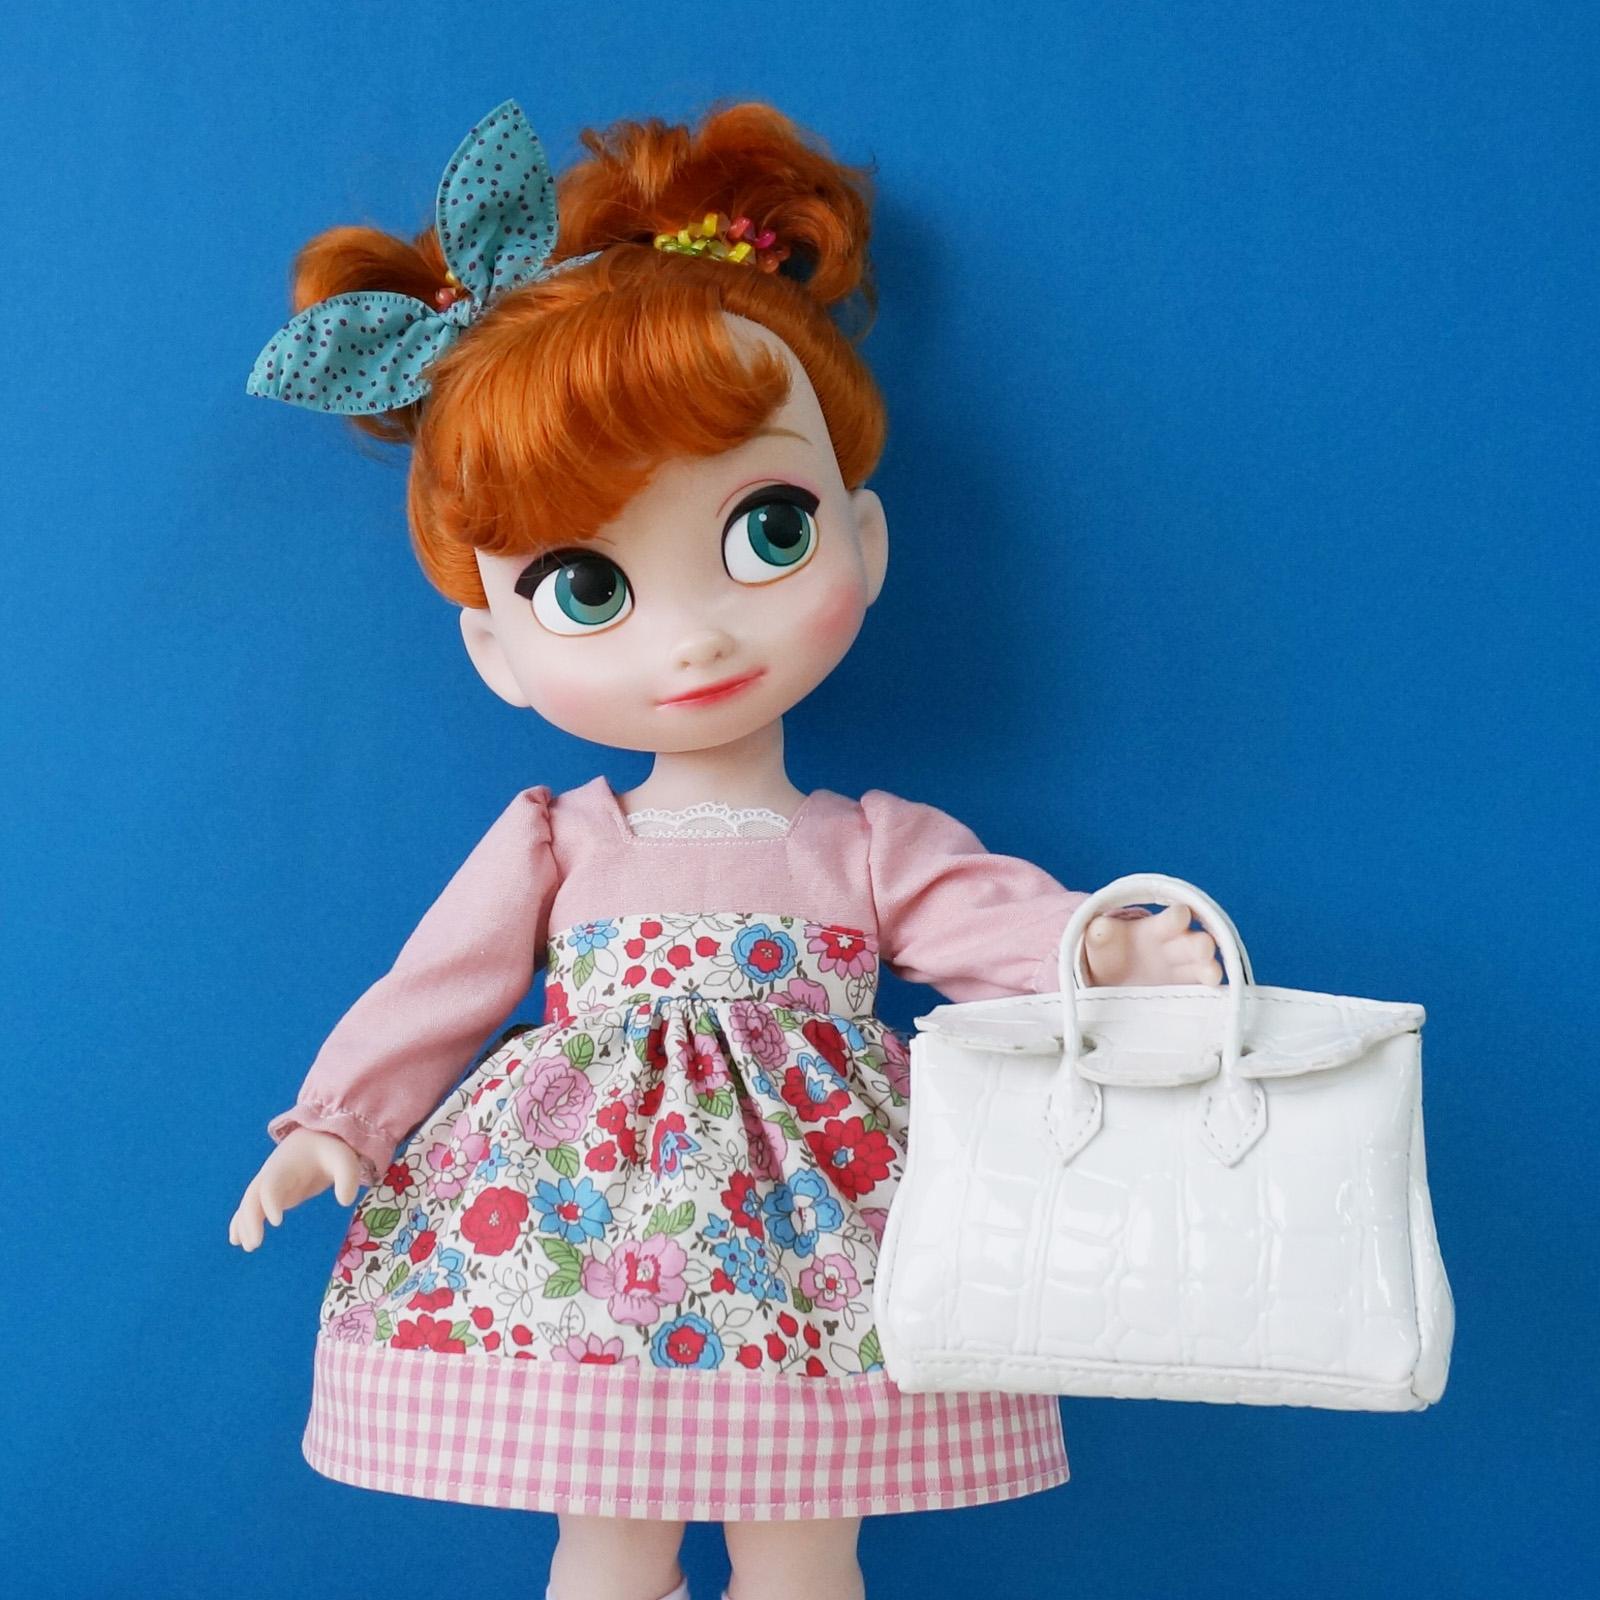 Disney Princess Doll Clothes: Disney Baby Doll Totebag Handbag Clothes Clothing Animator